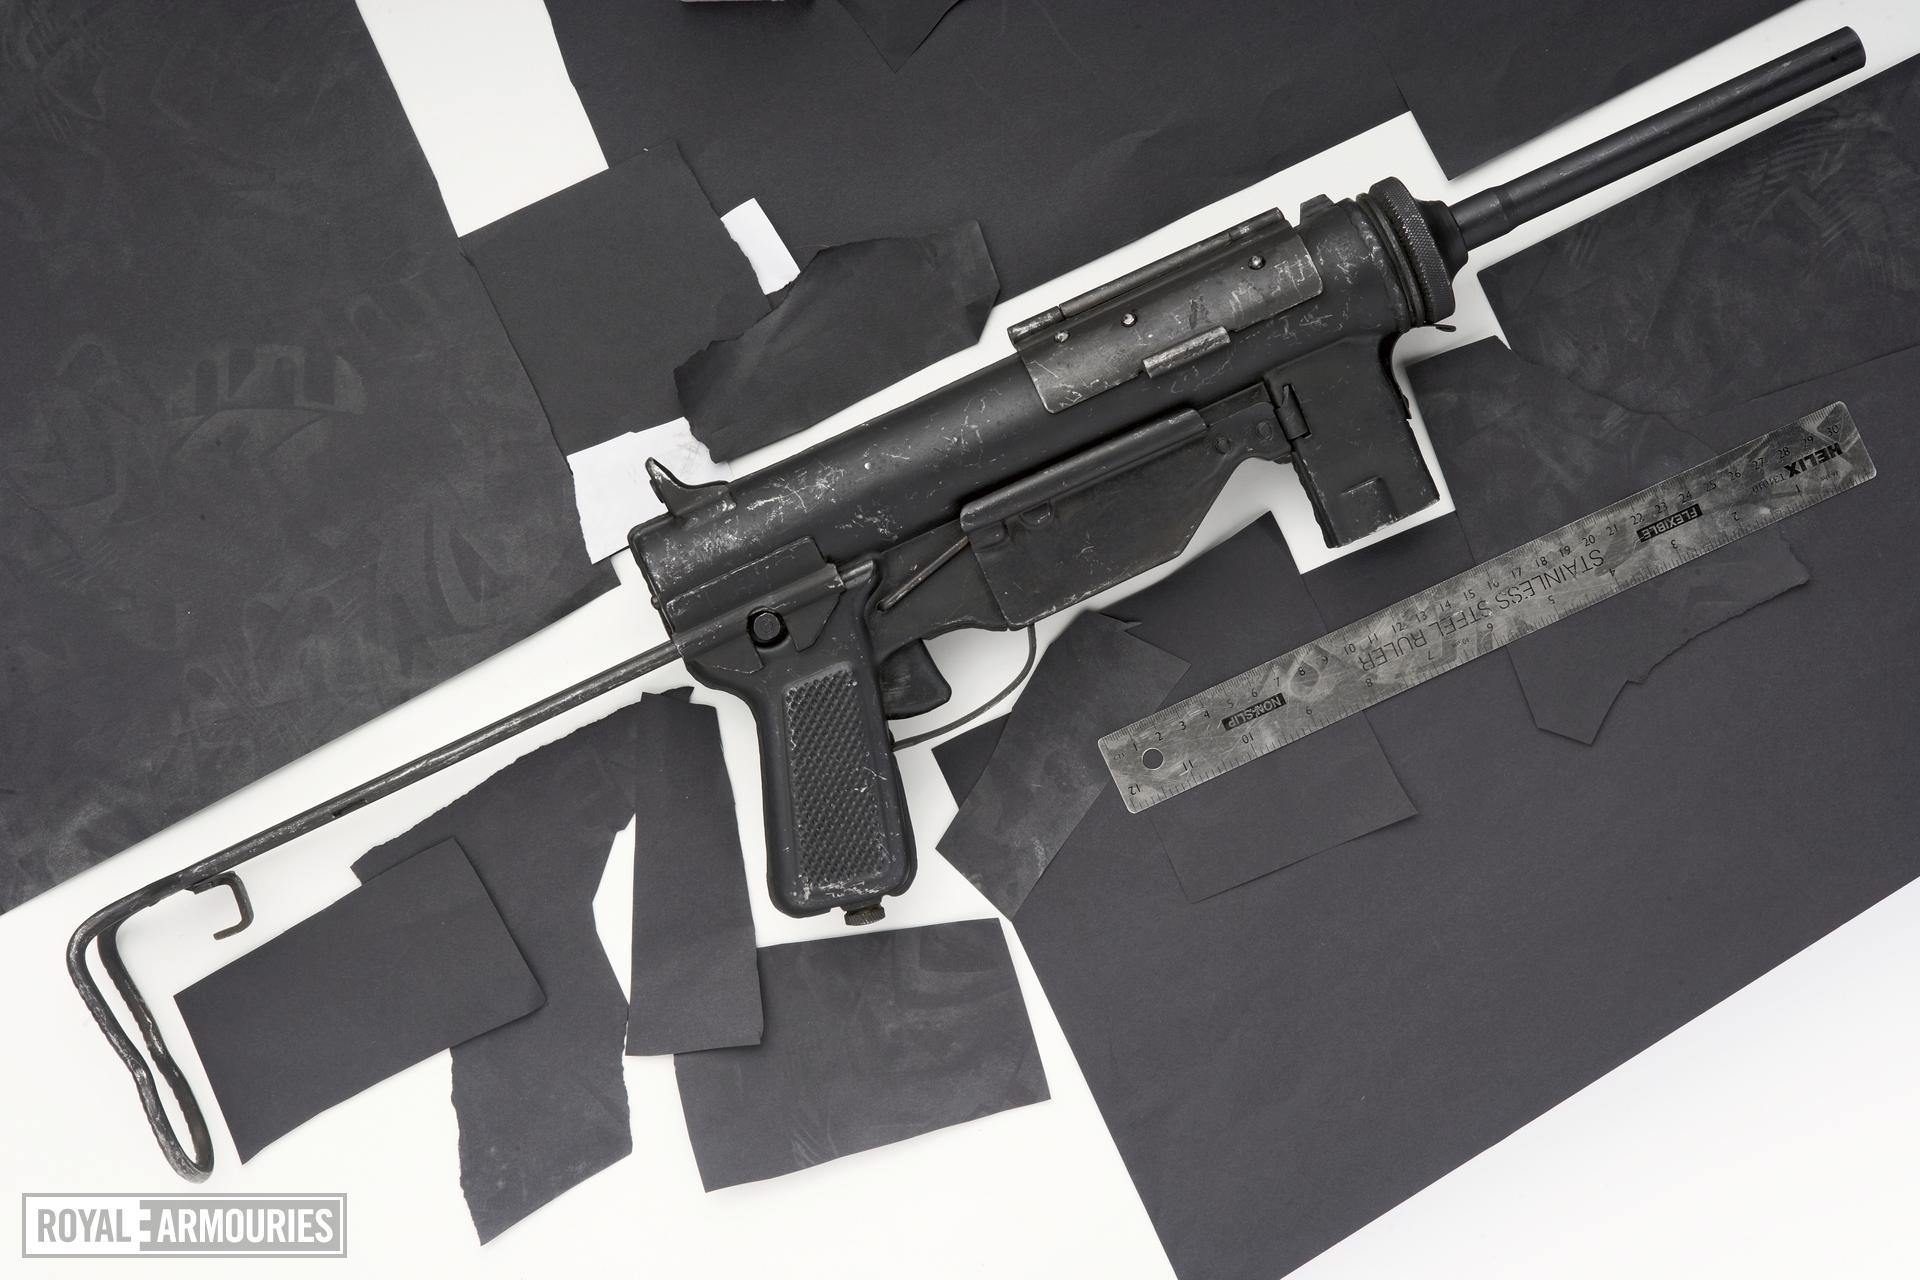 Centrefire automatic submachine gun - Type 39